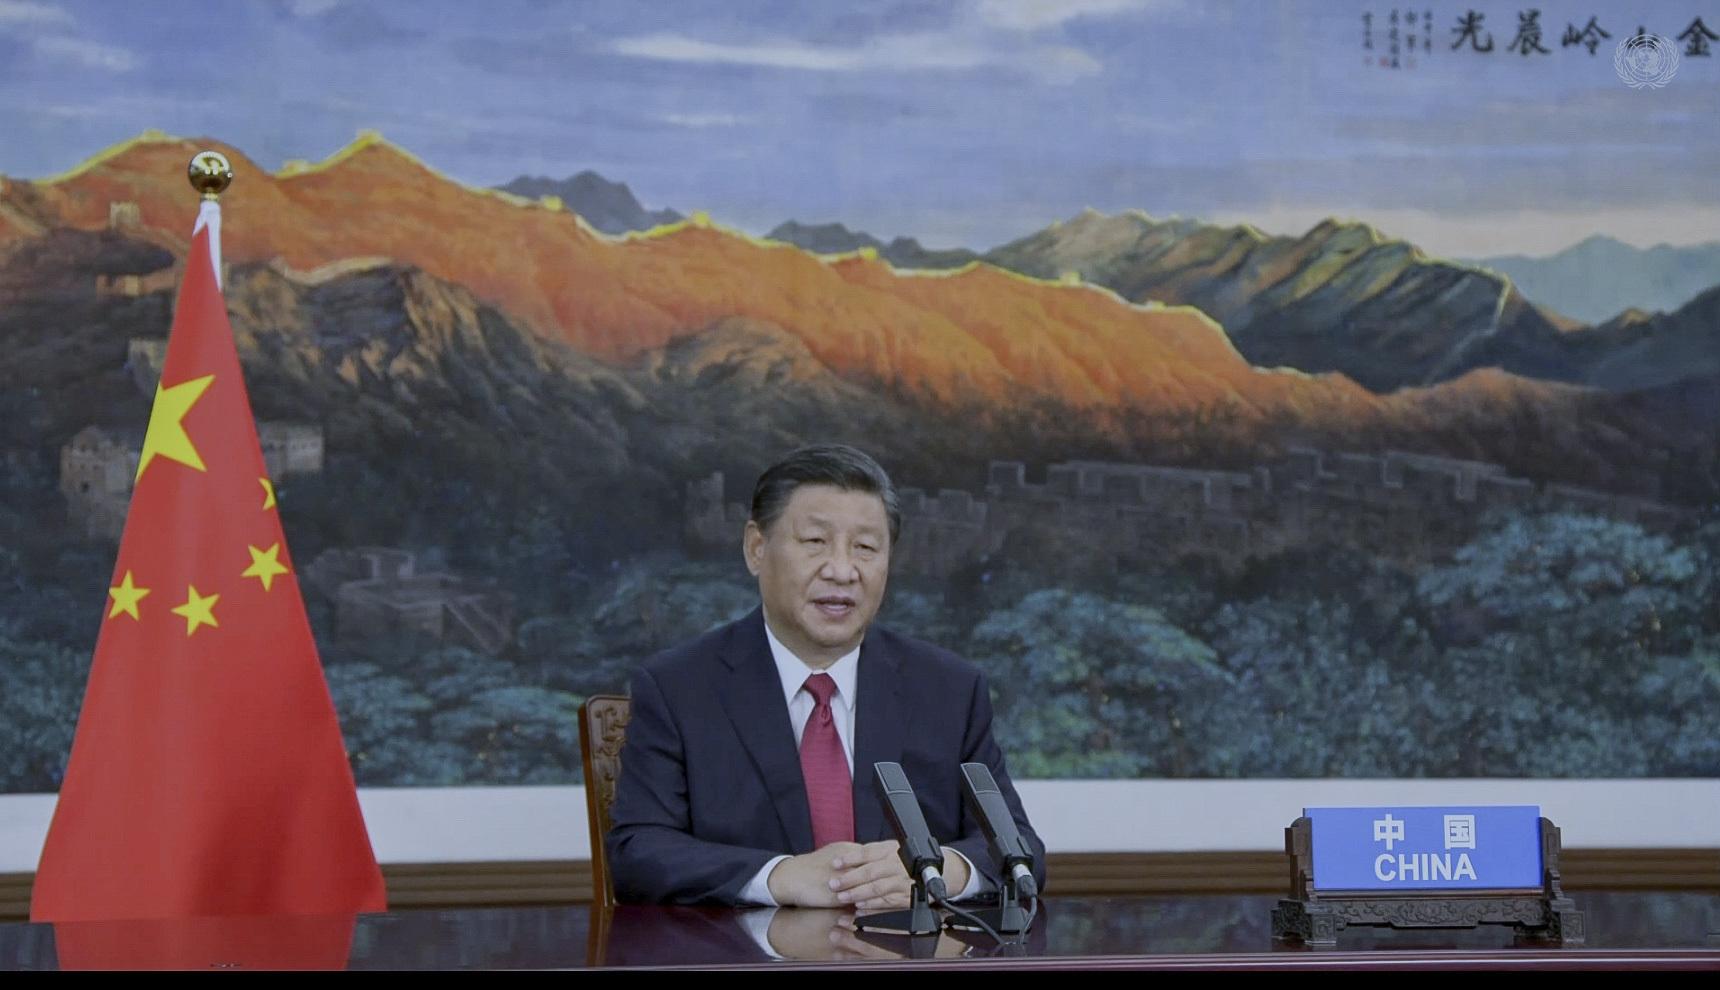 Xi Jinping, President, People's Republic of China